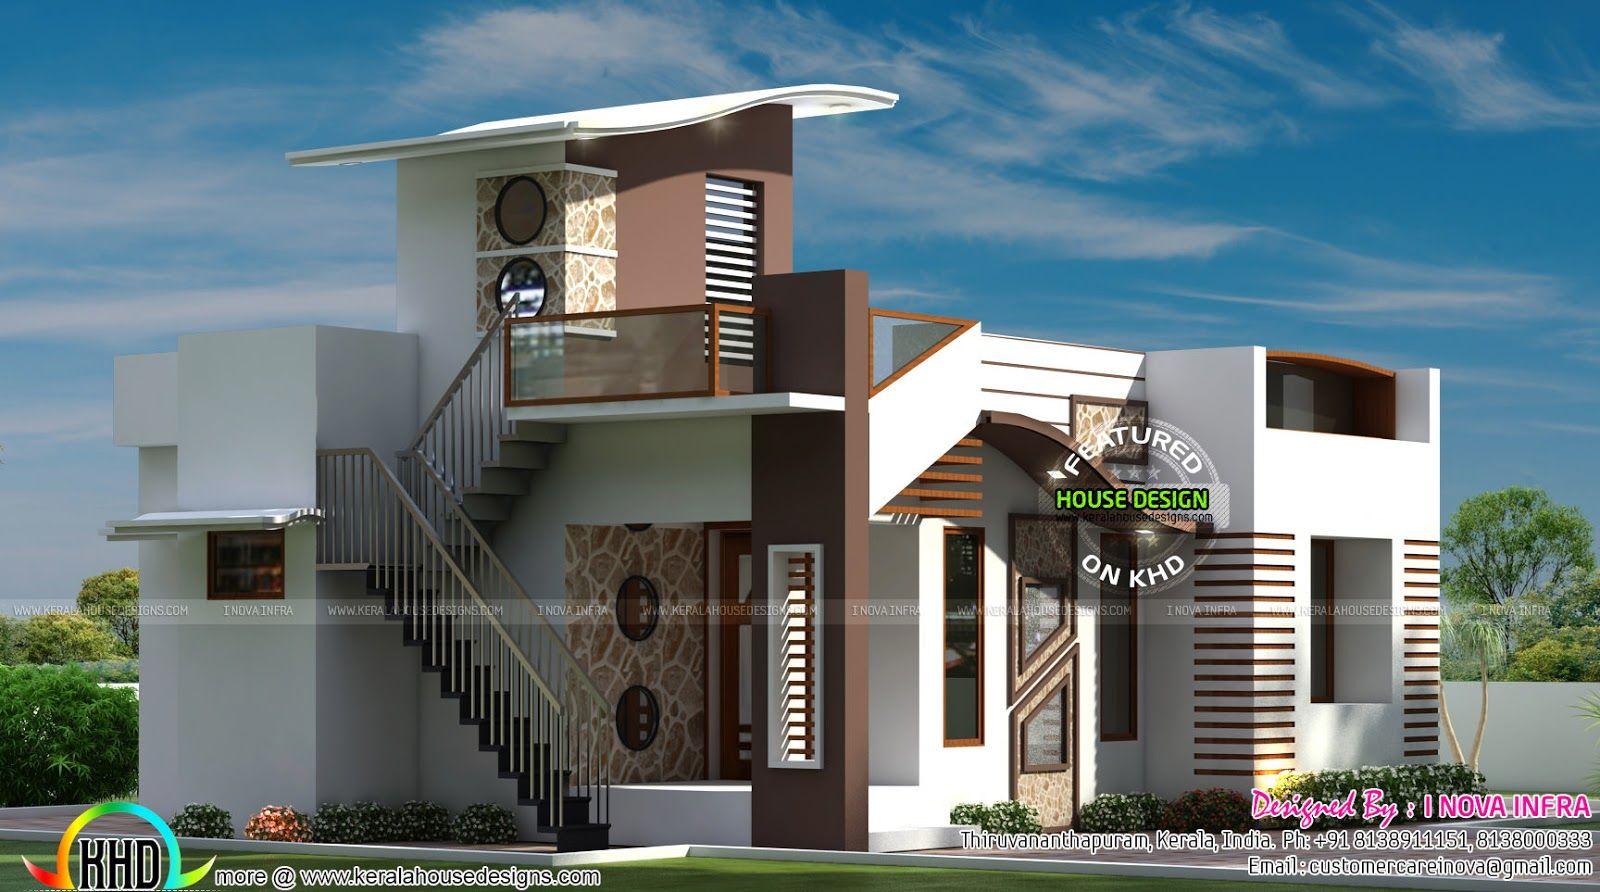 800 Sq Ft Budget Contemporary House Kerala House Design Contemporary House Contemporary House Design